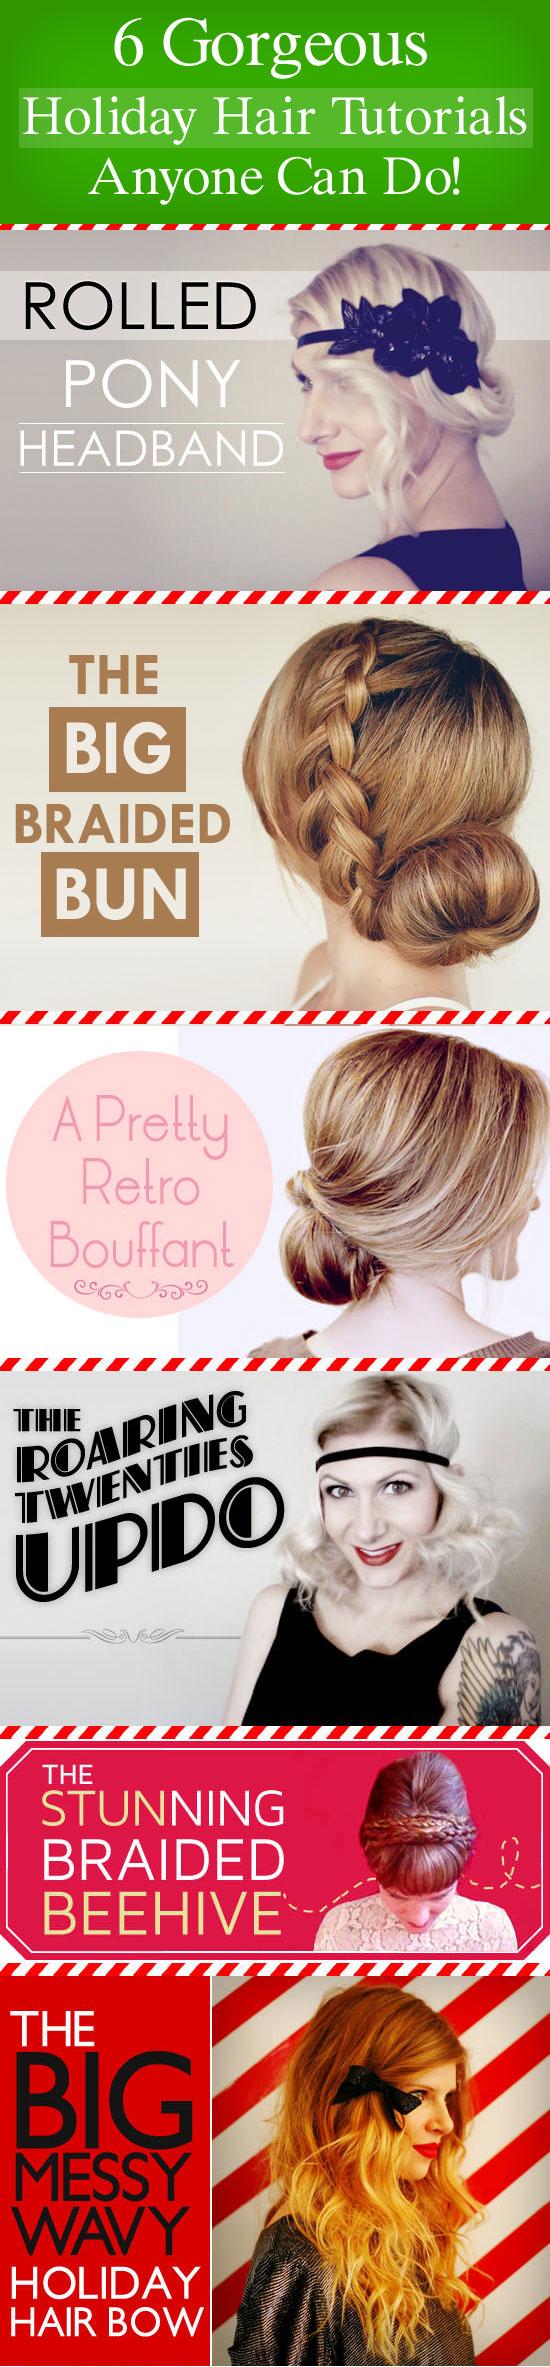 holiday hair tutorials